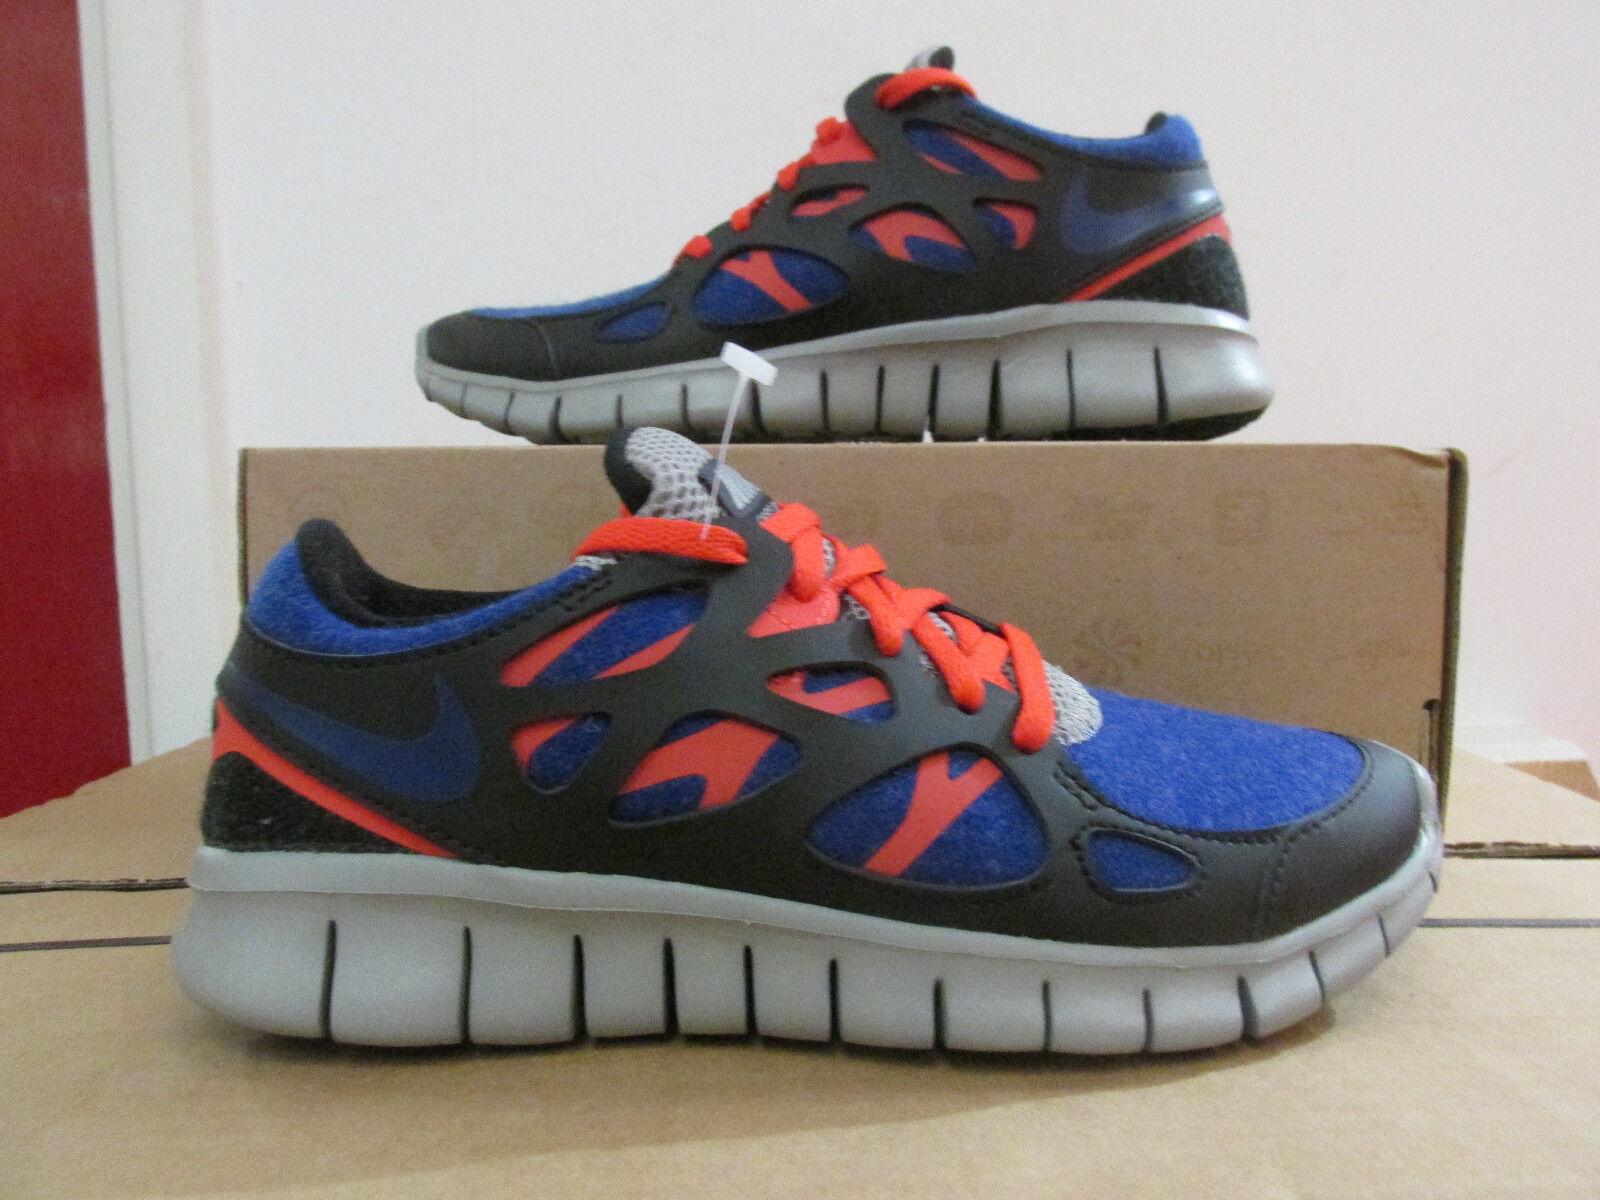 Nike Free Run + 2 Ext Zapatillas aclaramiento para mujer 536746 400 aclaramiento Zapatillas af3203